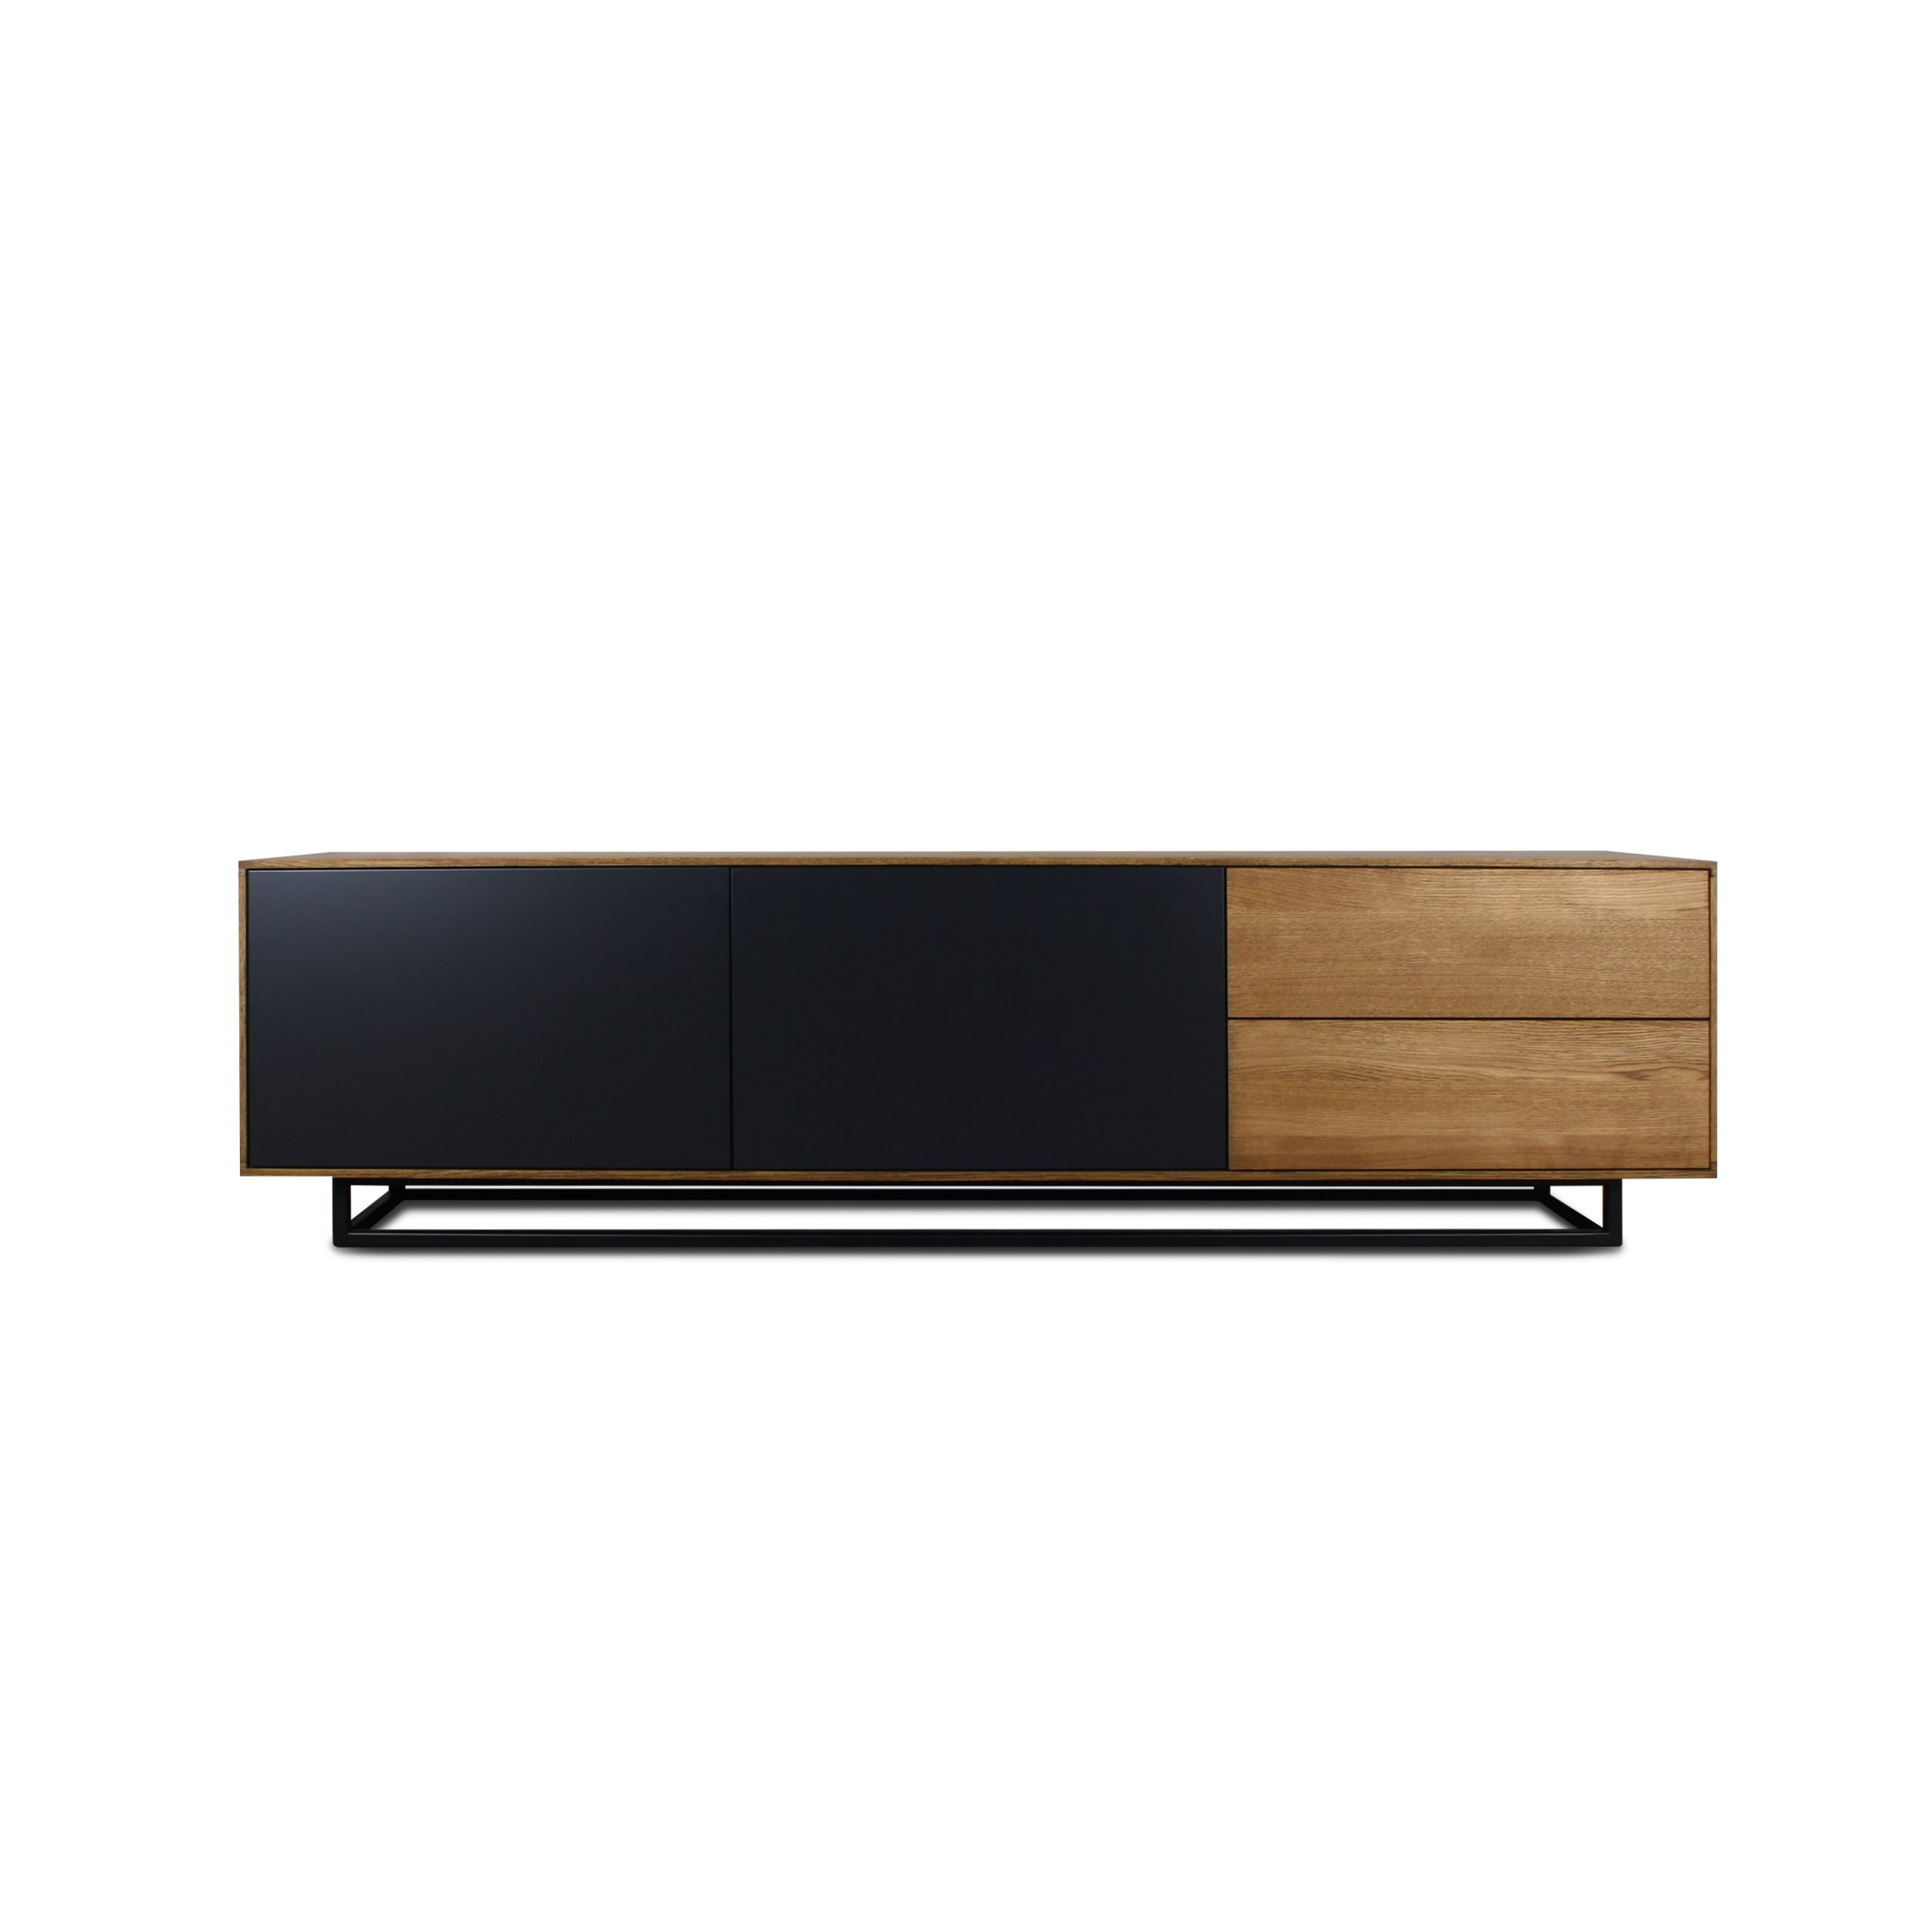 Juga-furniture-baldu-gamyba-vilniuje-tv-spintele-VILI-produktas-1